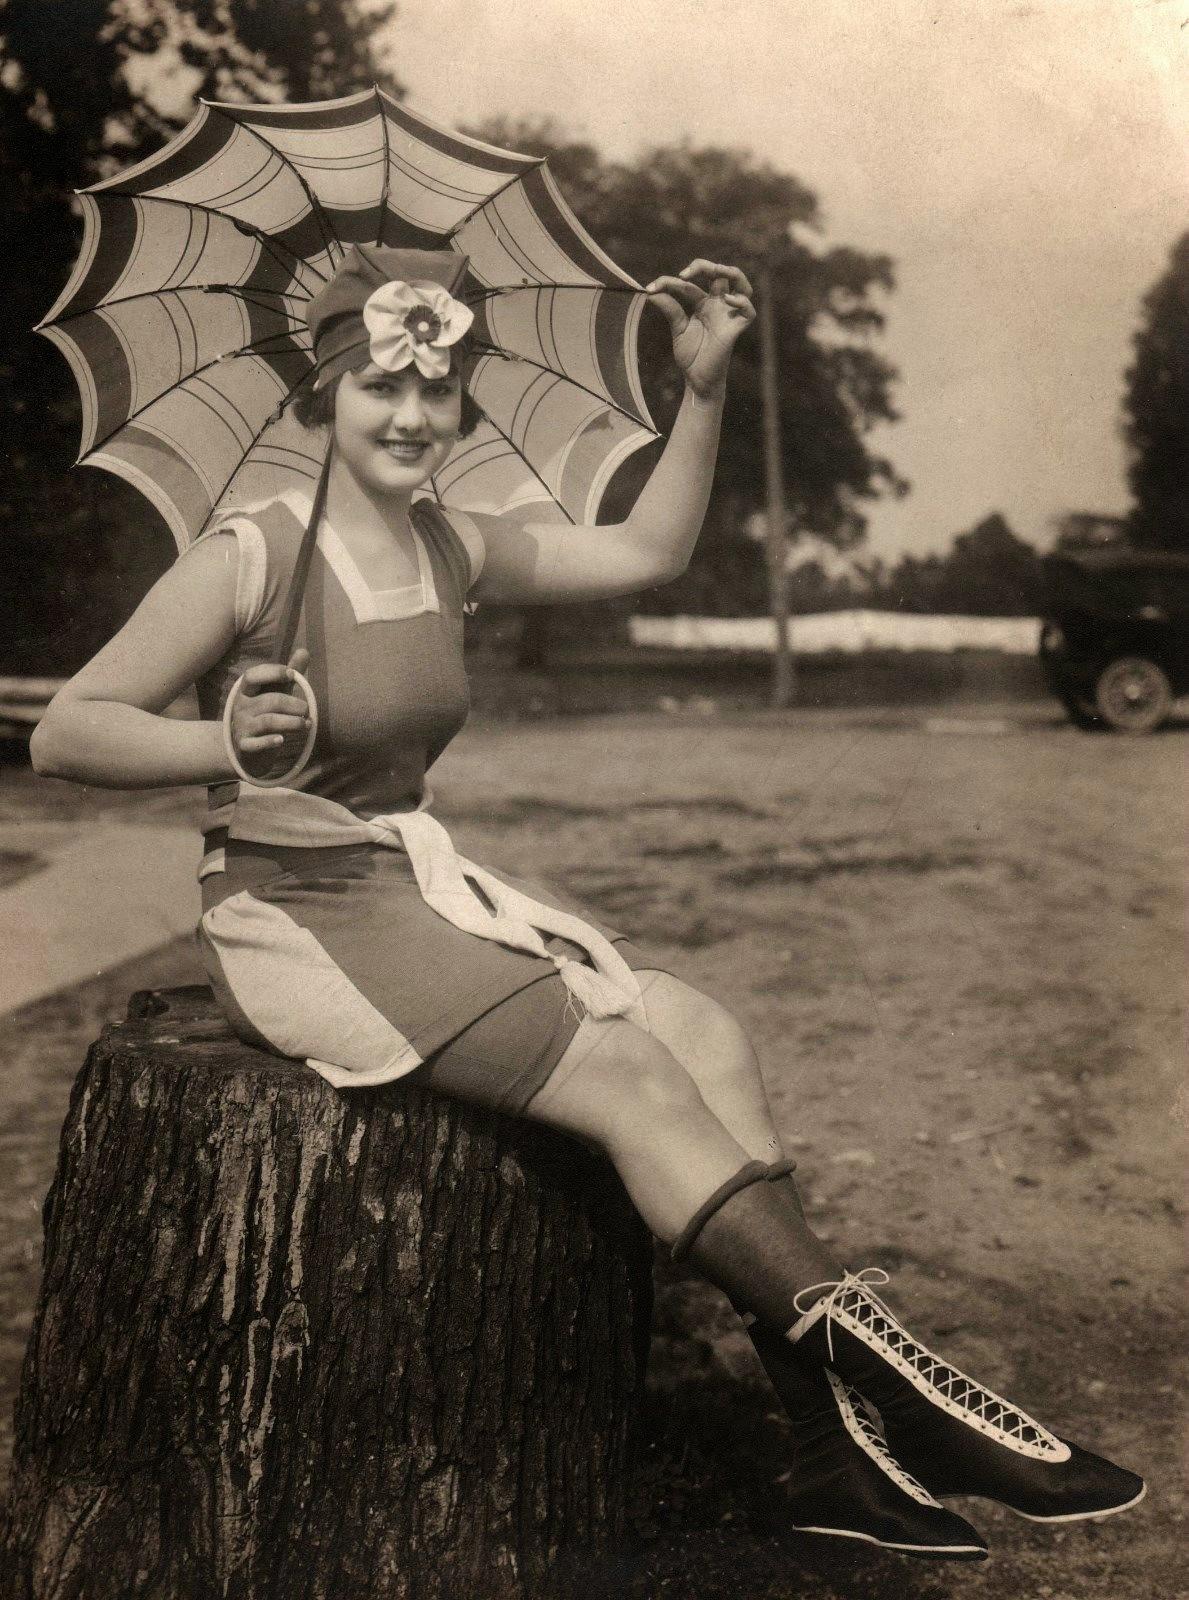 1920s Bathing | 1920 s bathing suits 1920s pinterest, 1920